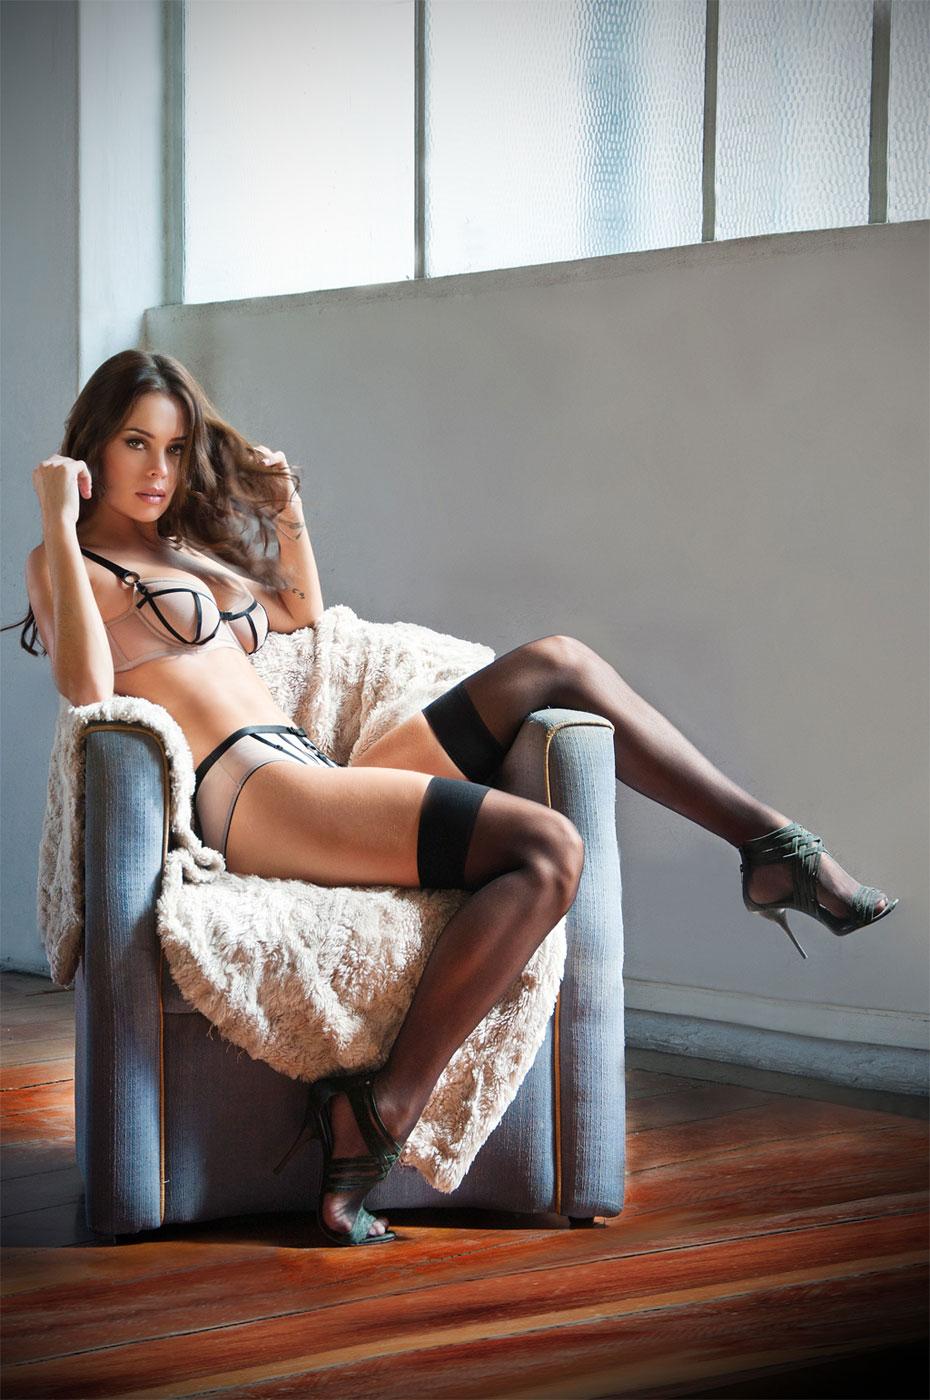 francine nude in high heels